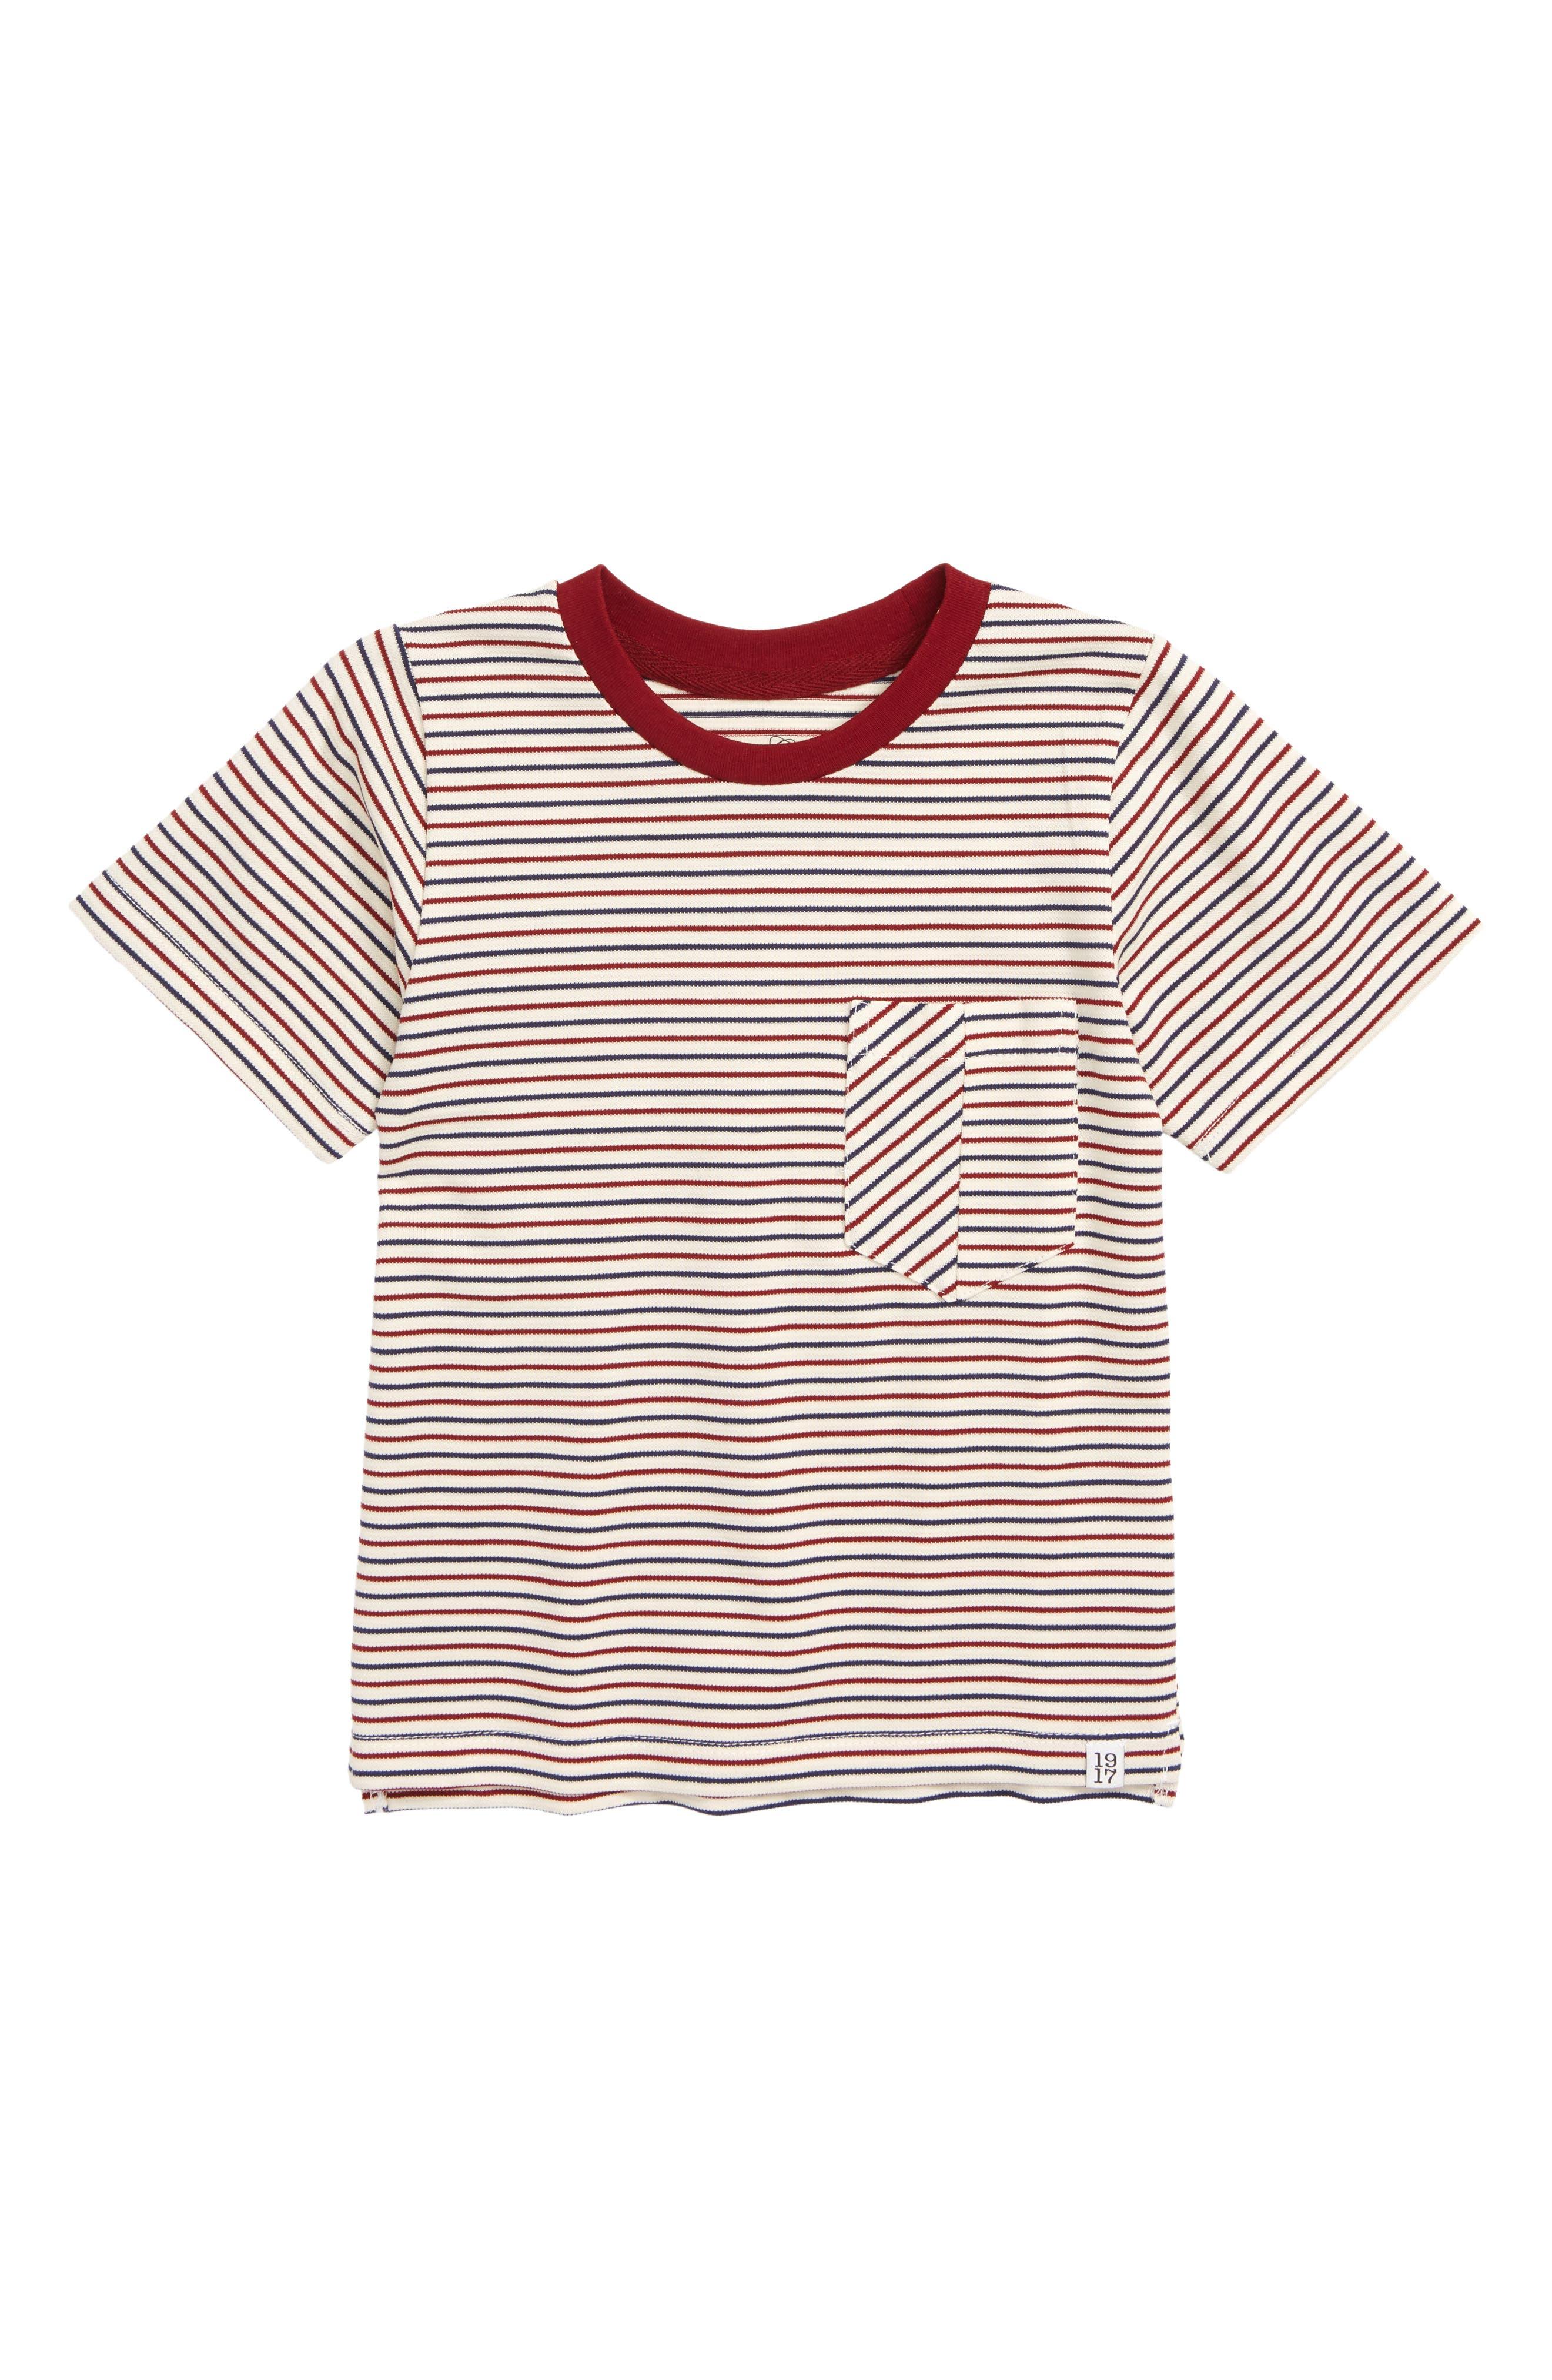 SOVEREIGN CODE Castle Stripe Pocket T-Shirt, Main, color, 640